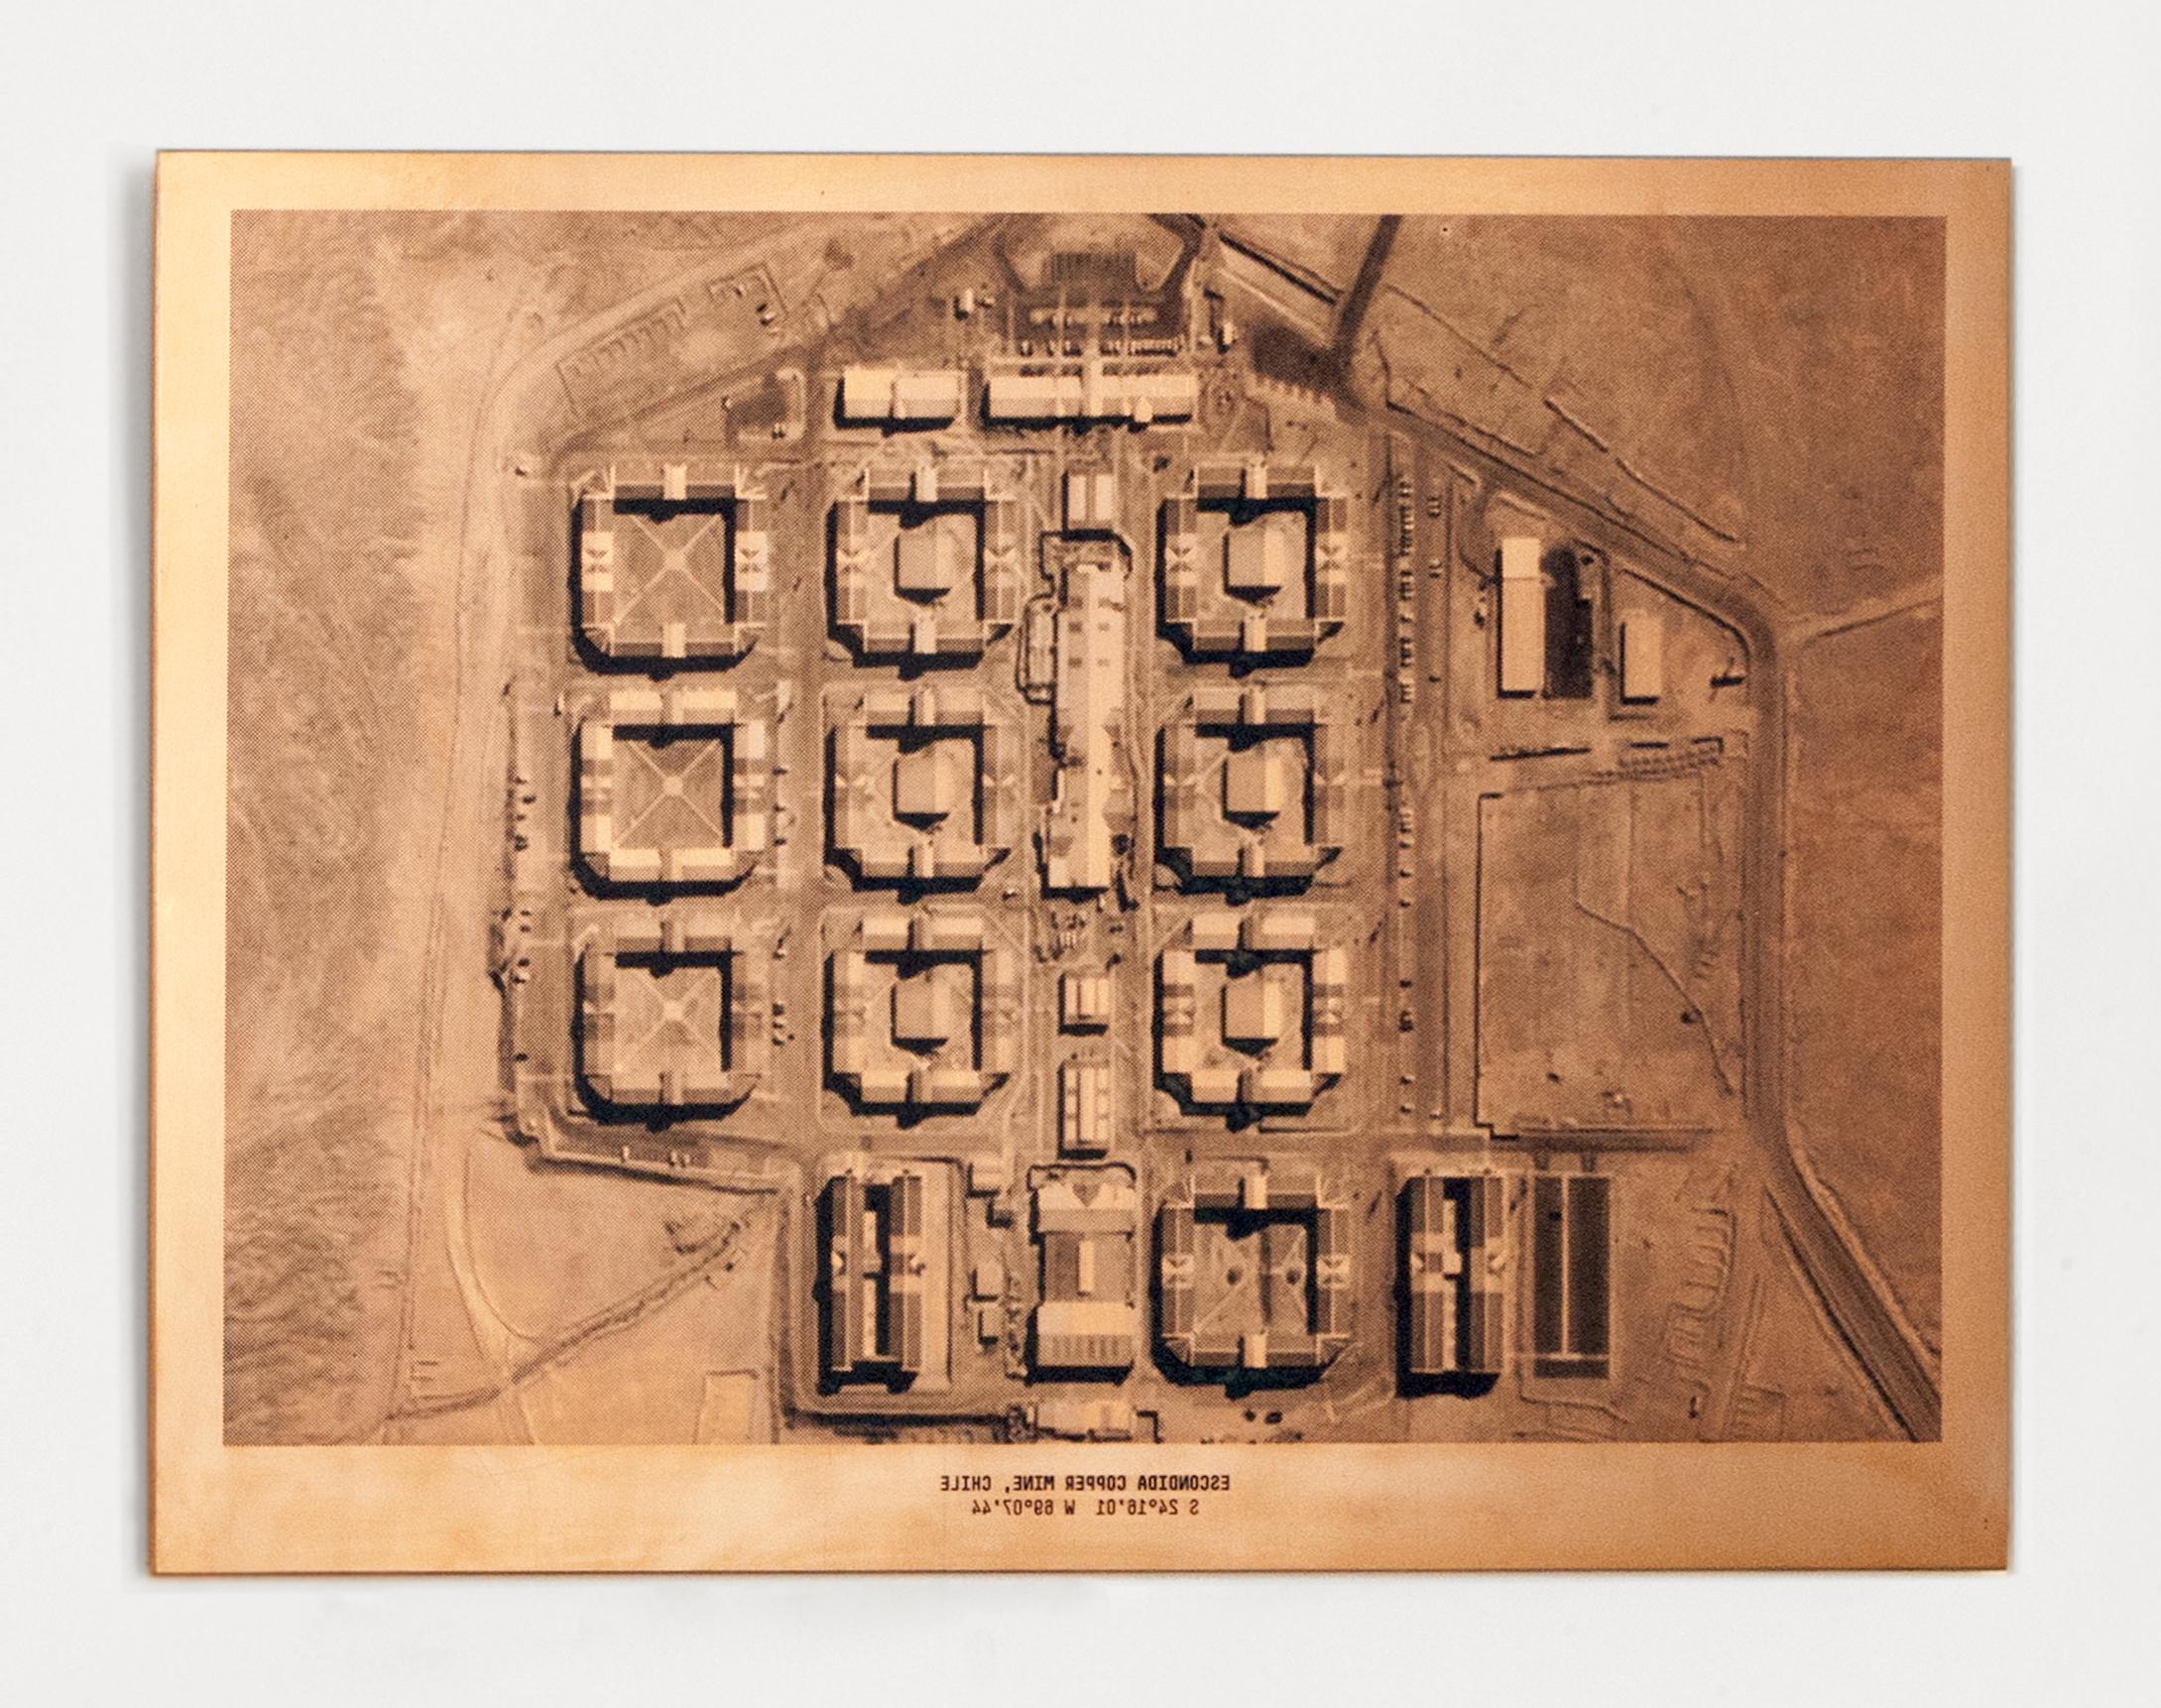 The Copper Project - Mining Etching 4 crop - David Derksen Design.jpg